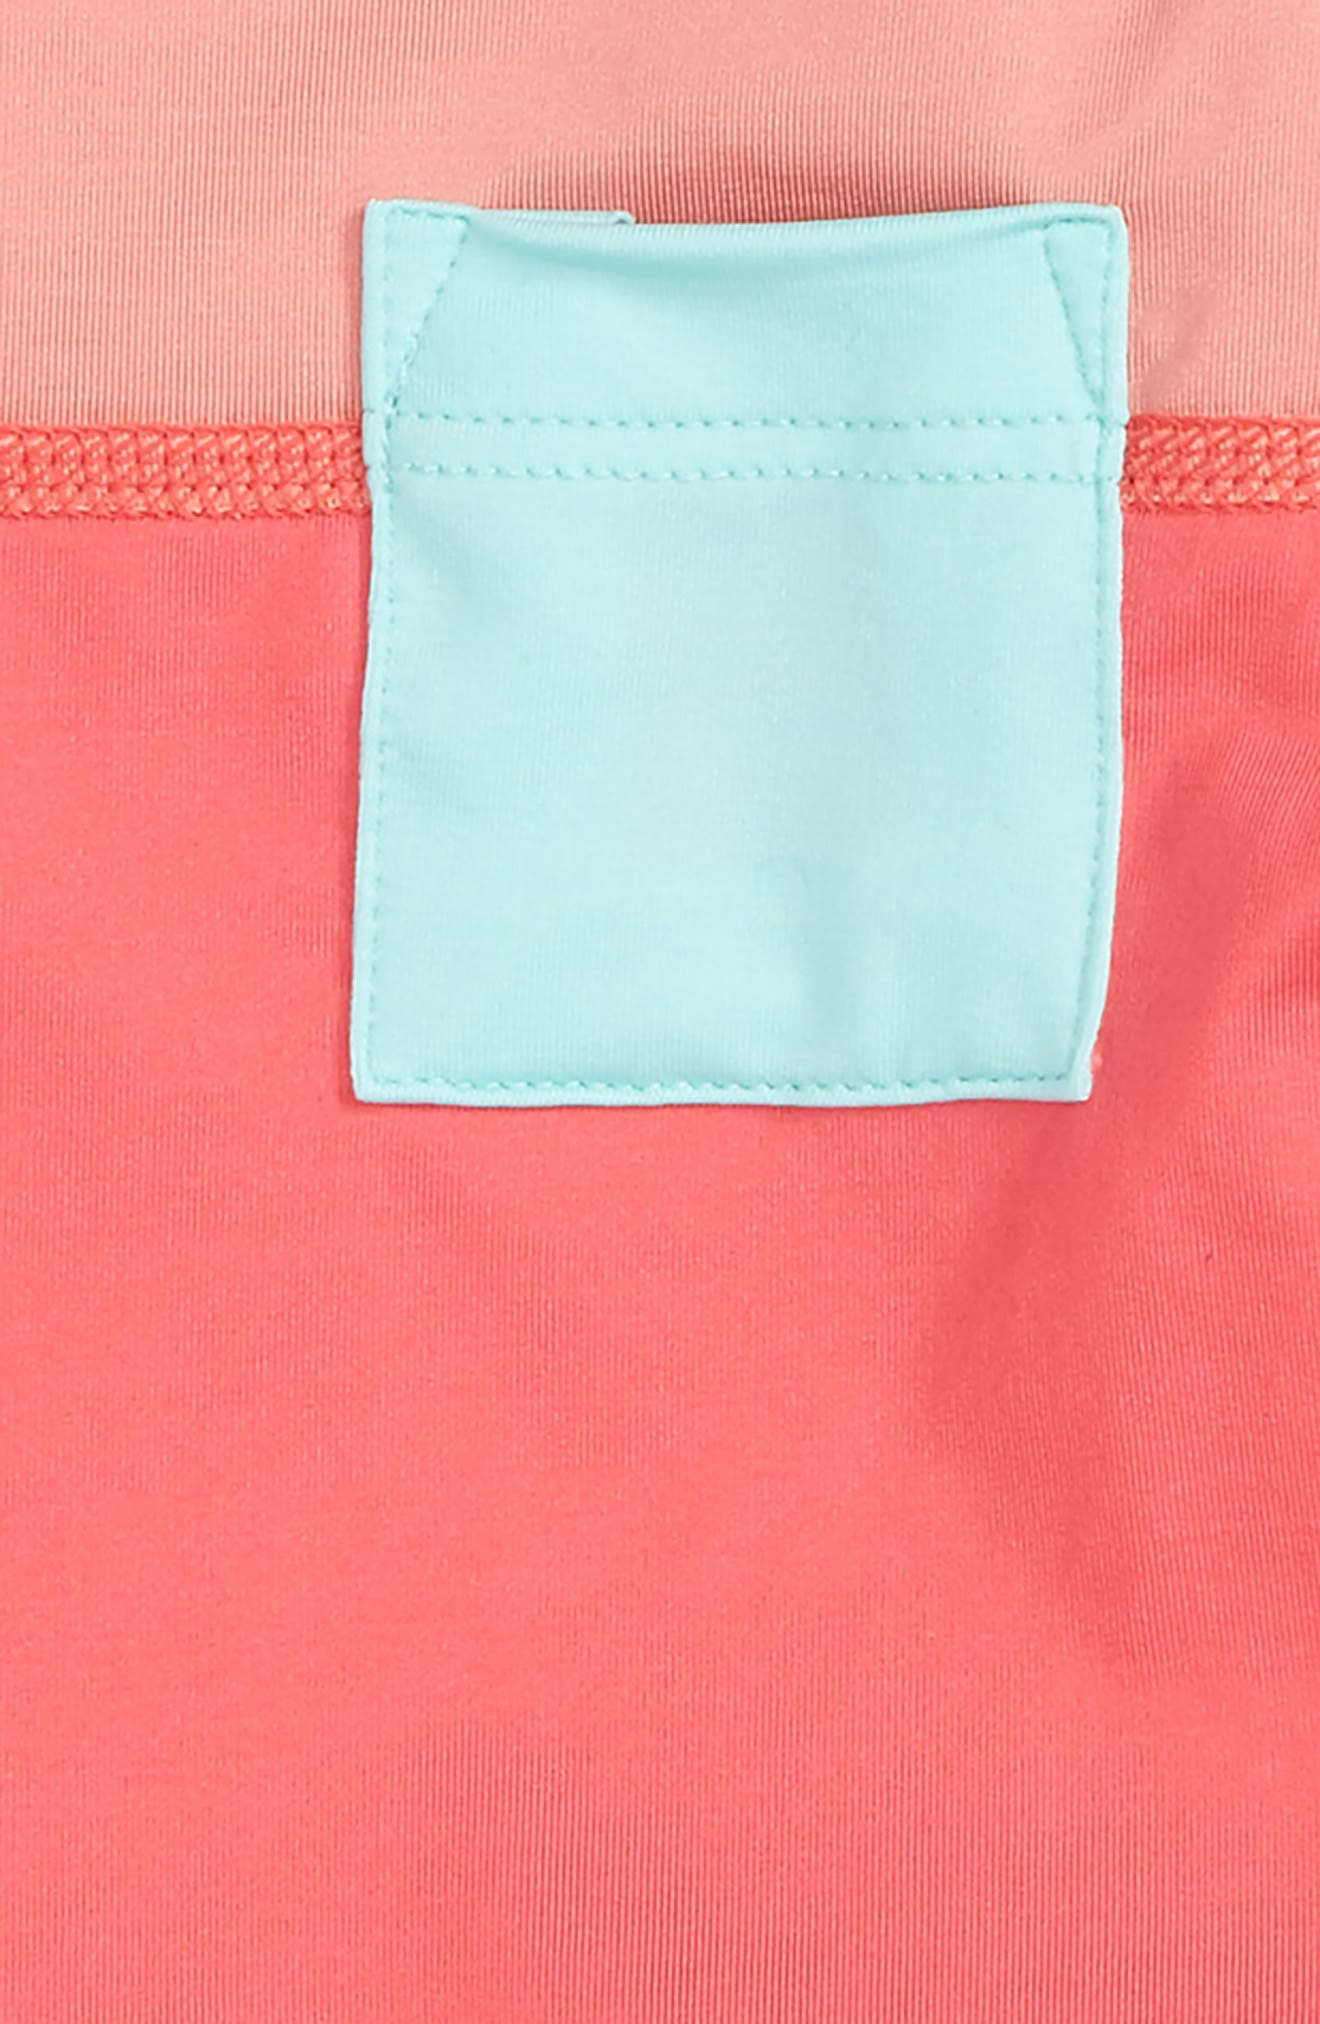 'Little Sol' Two-Piece Rashguard Swimsuit,                             Alternate thumbnail 2, color,                             Srap Sierra Pink